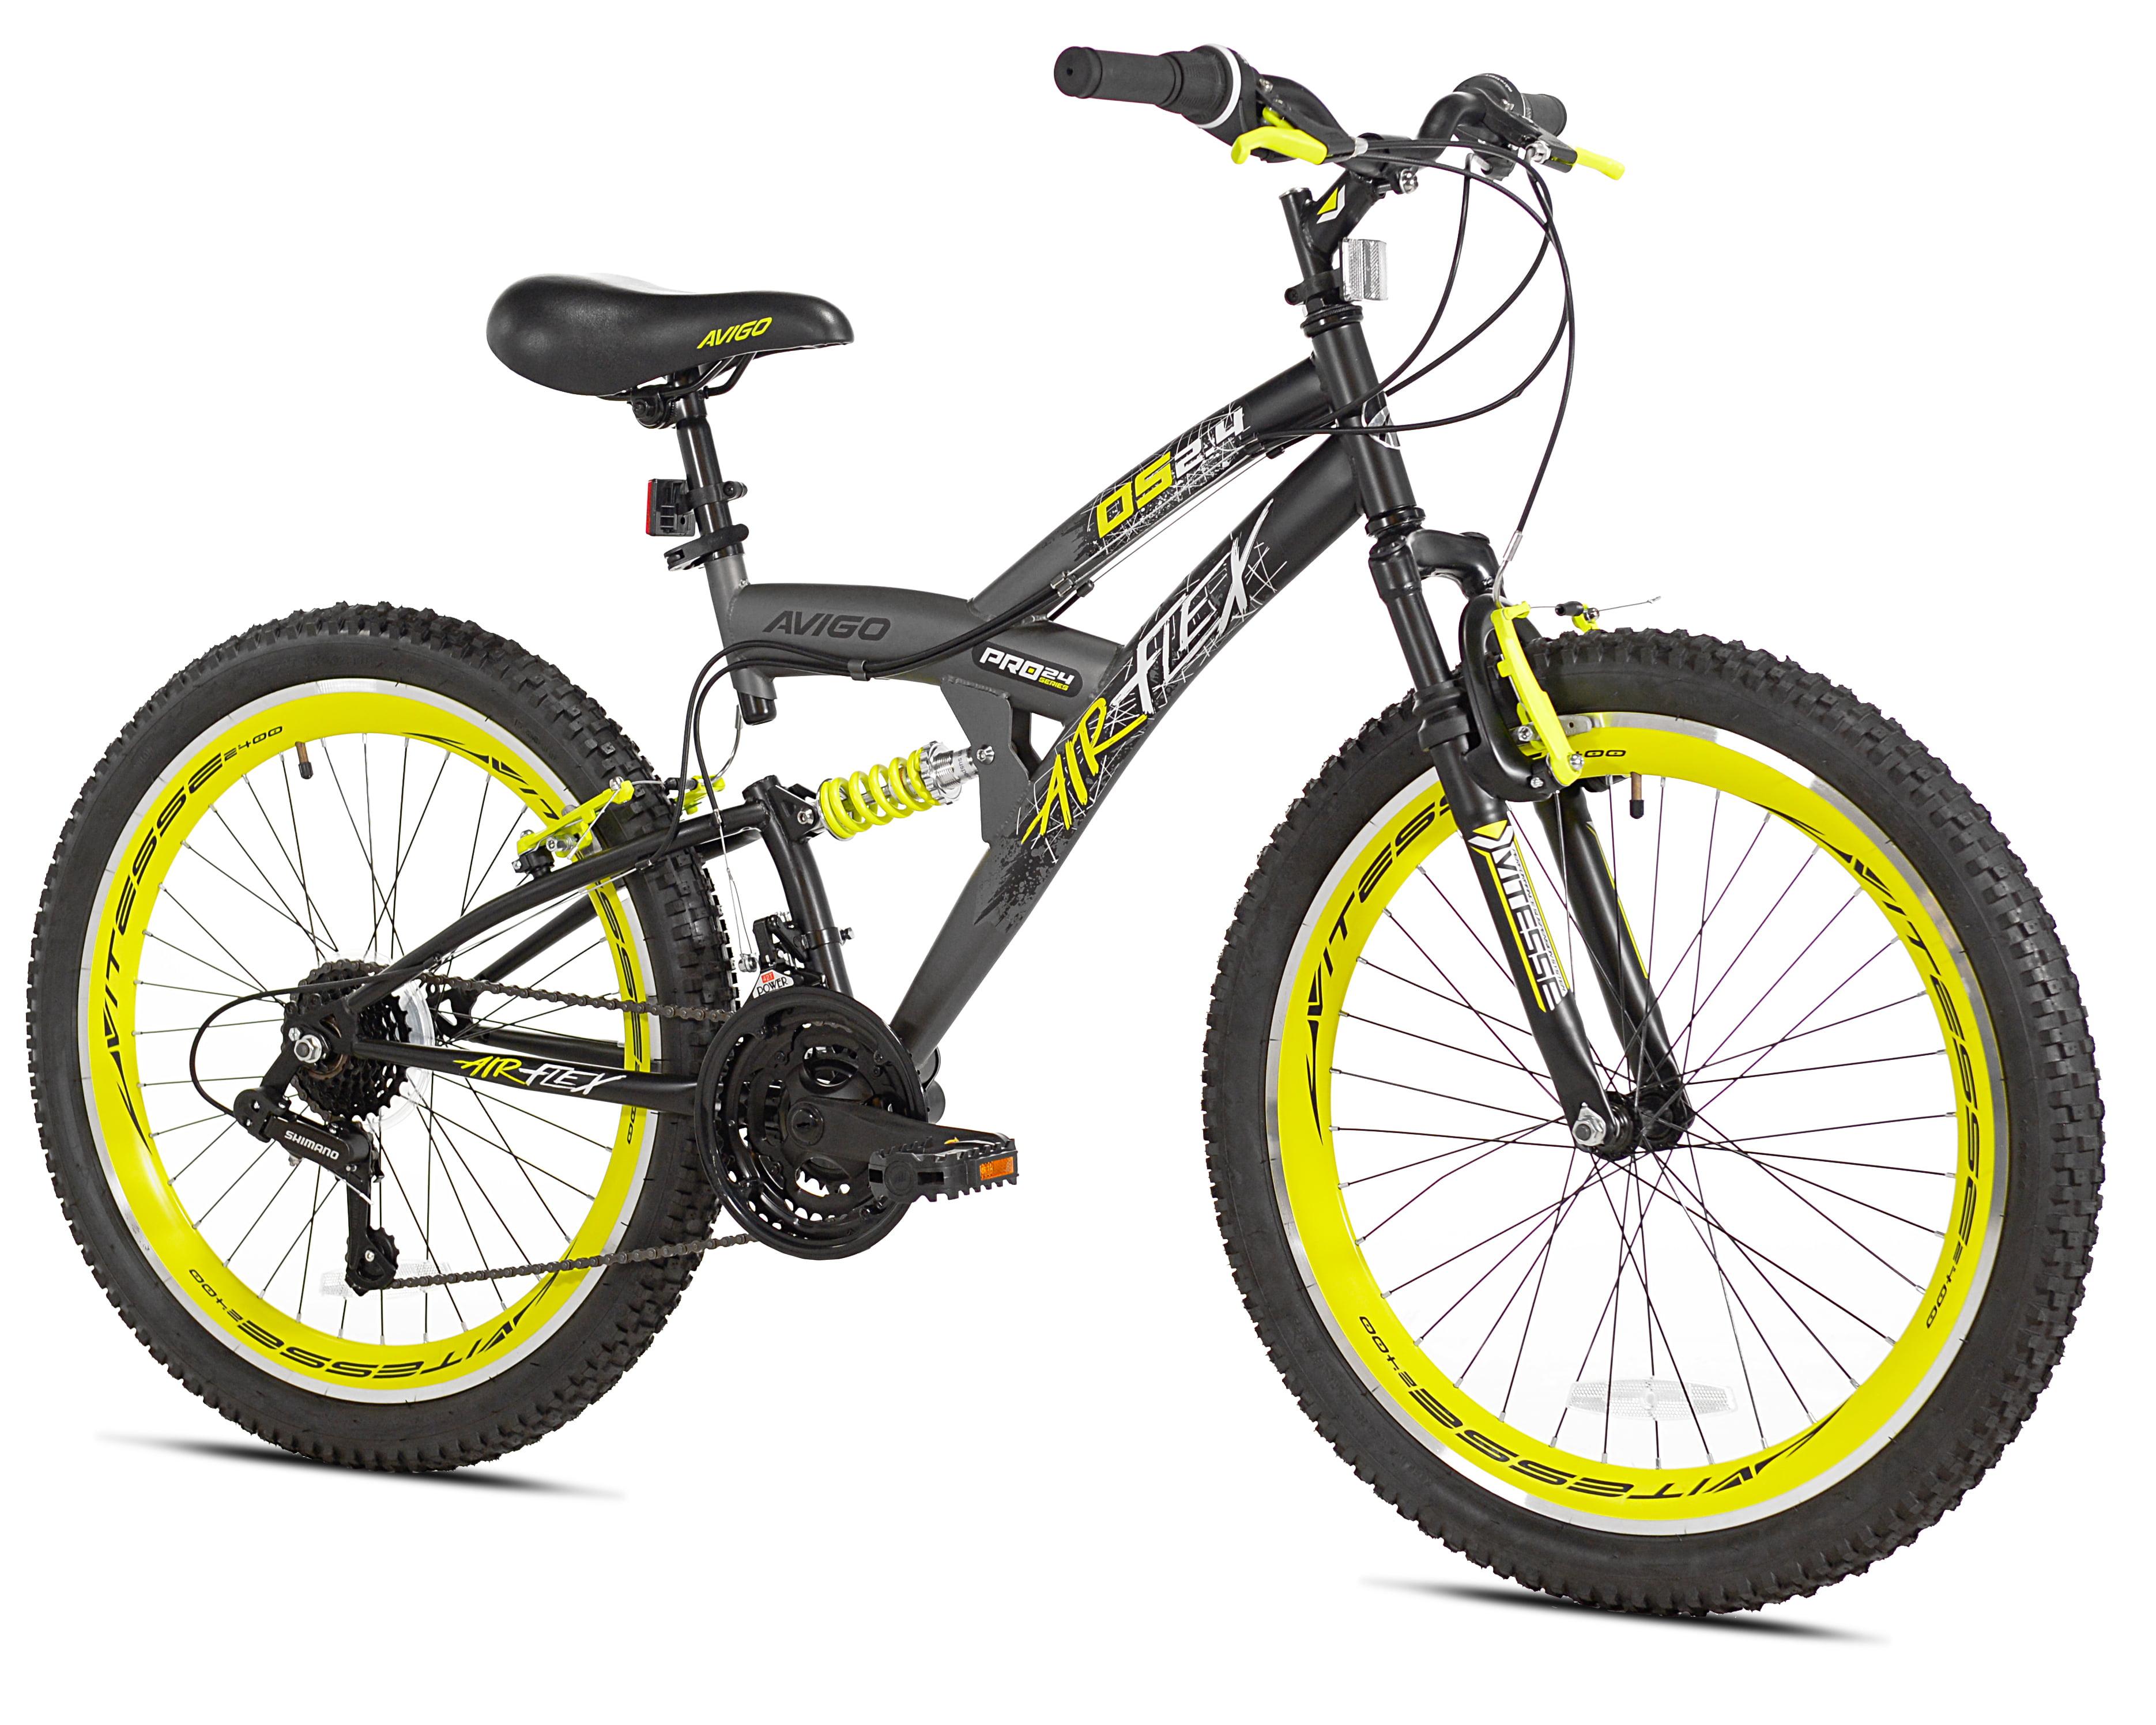 "Avigo 24"" Men's, Air Flex Dual Suspension Bike, Grey, For 4'6"" Height Sizes and Up by Kent International Inc"